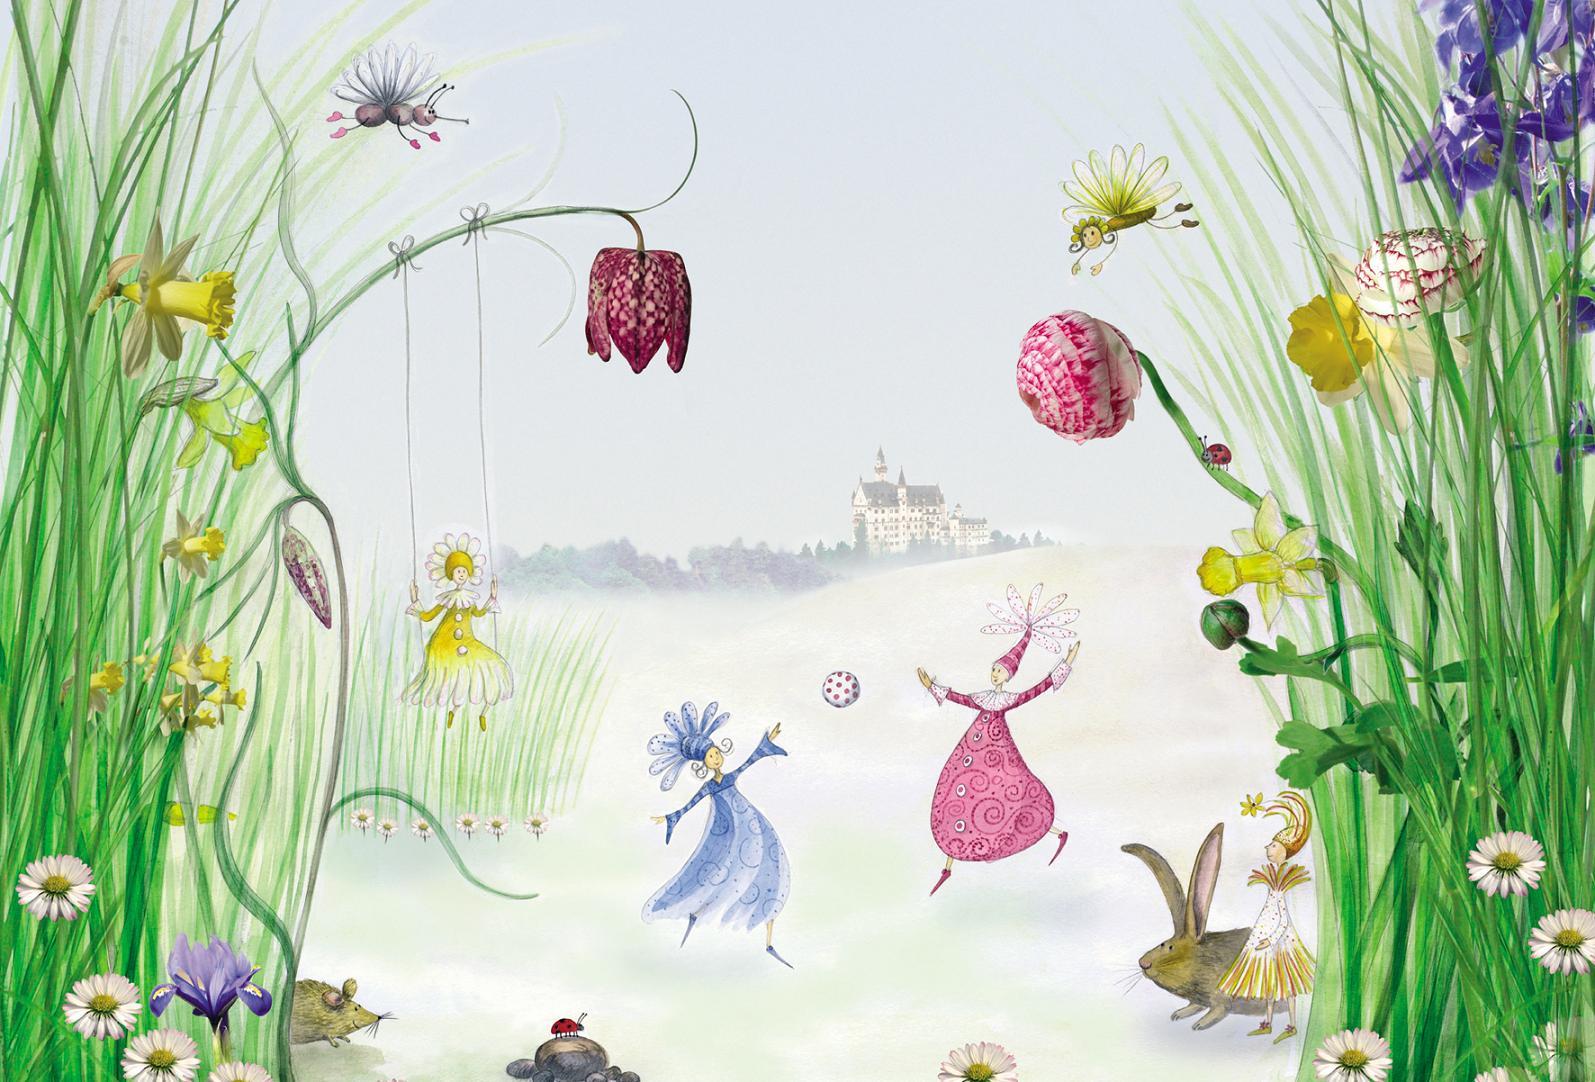 fototapete kinderzimmer-deko bild wand-tapete princess | ebay